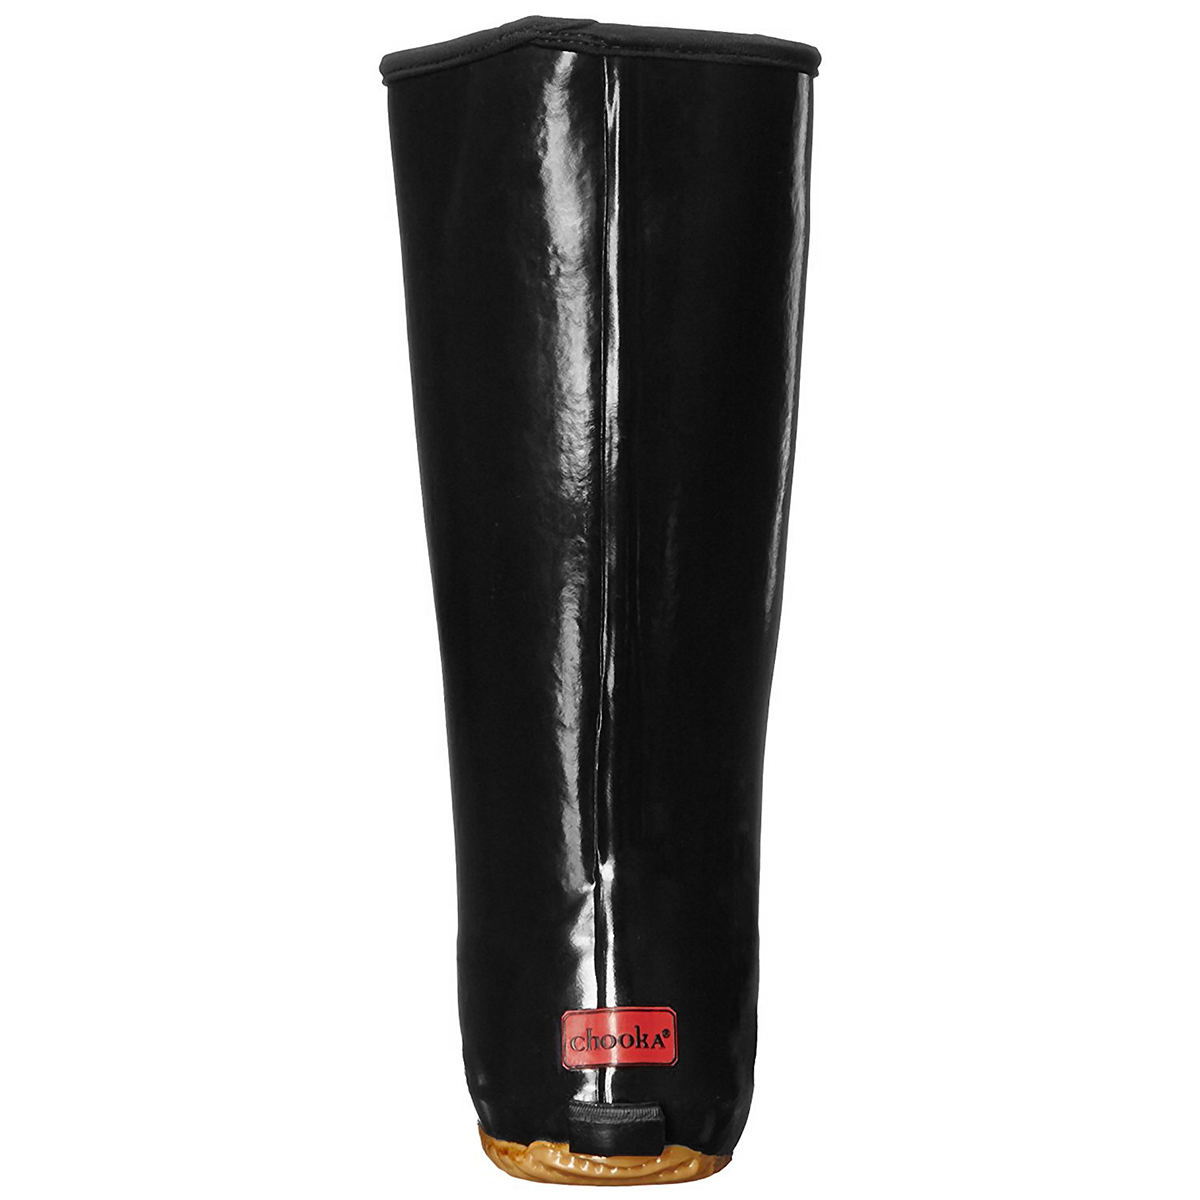 Chooka-Women-039-s-Rubber-Rain-Boots-Mid-Calf-With-Lightweight-Packable-Travel-Bag thumbnail 11